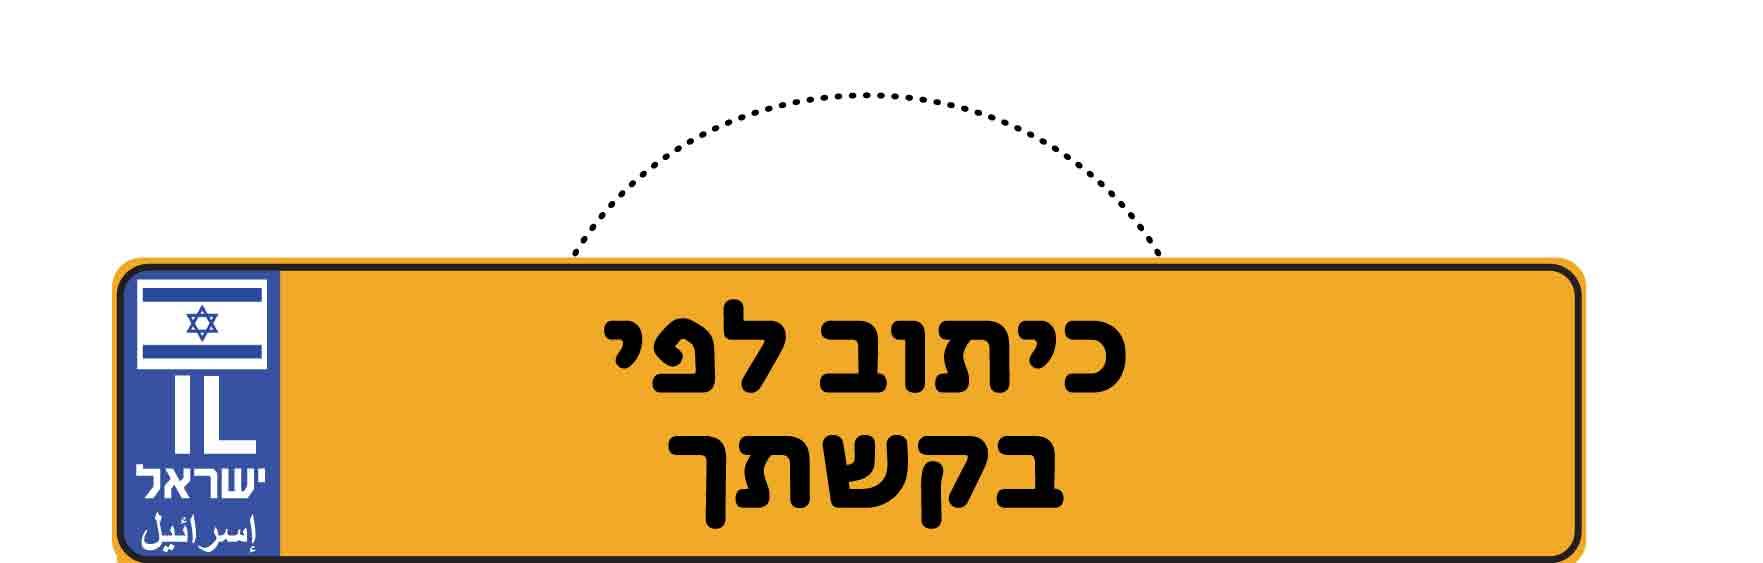 G1010 לוחית רישוי צהובה עם דגל 11/52 ס